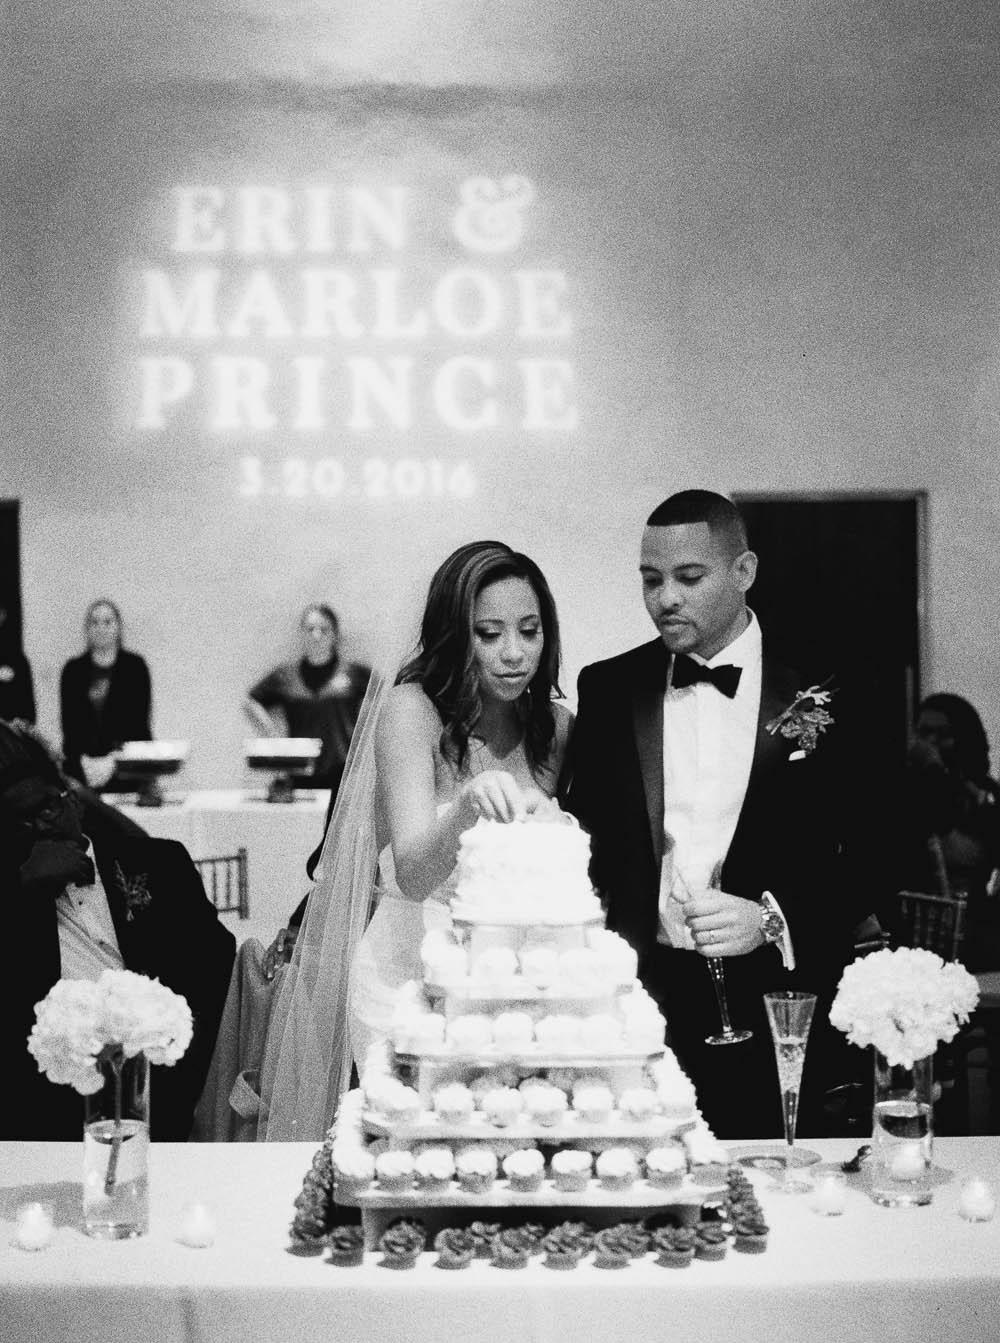 nashville ruby film documentary wedding photographer heartfelt real moments african american wedding munalachi bride ©2016abigailbobophotography-53.jpg